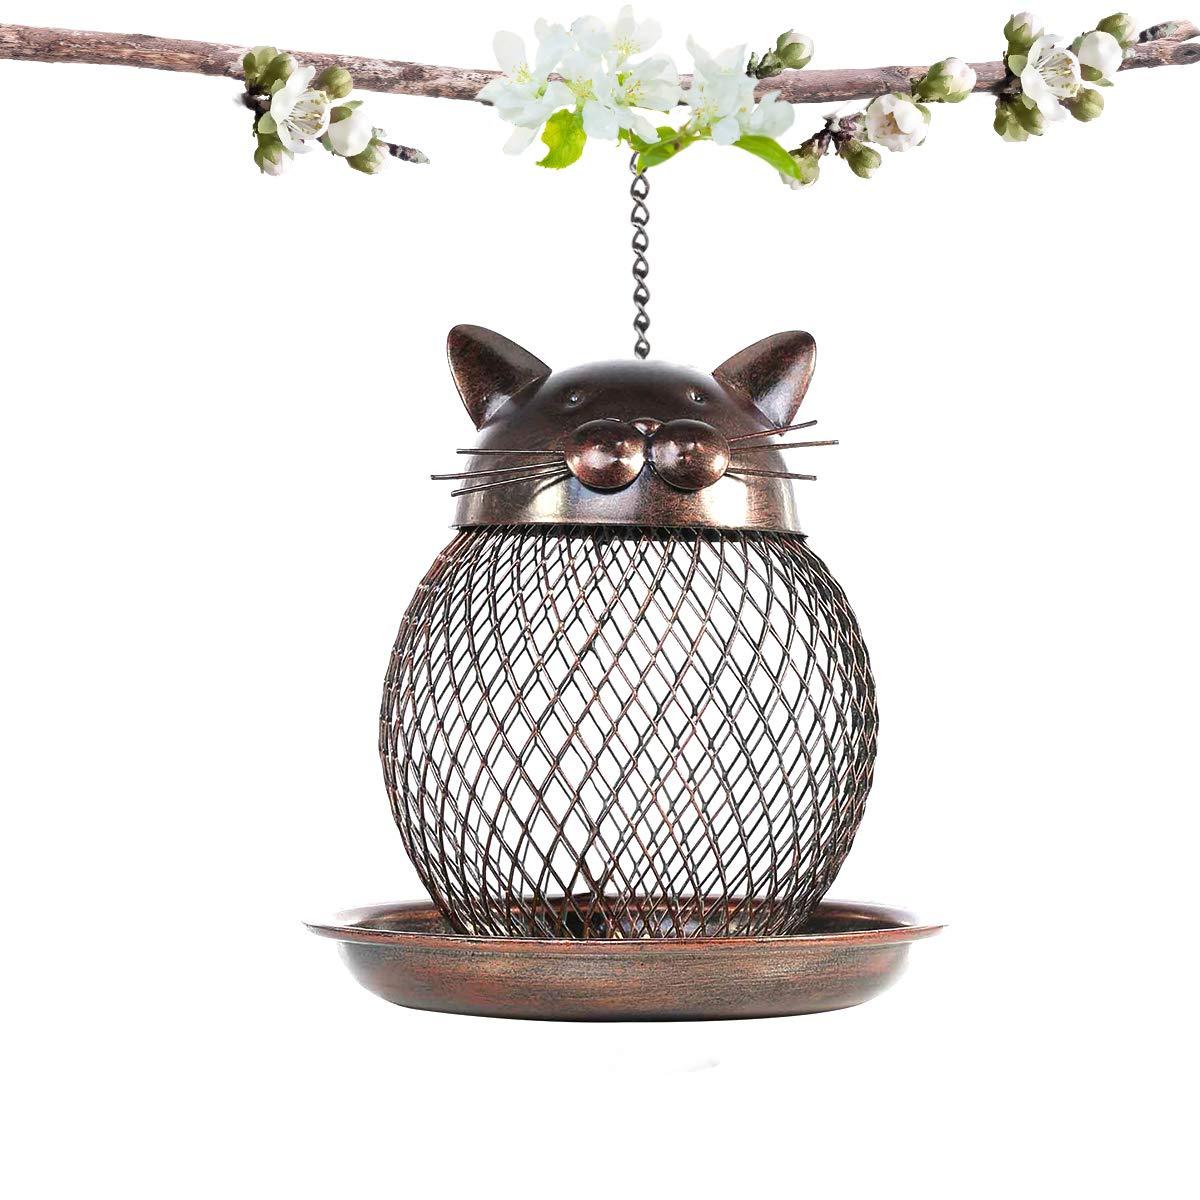 PETRIP Bird Feeders for Outside Wild Bird Feeder for Finch, Cardinal Bluebird Hummingbird feeders for Outdoors, Cat-Shaped Antique Patio Decor (cat-Bird Feeder)